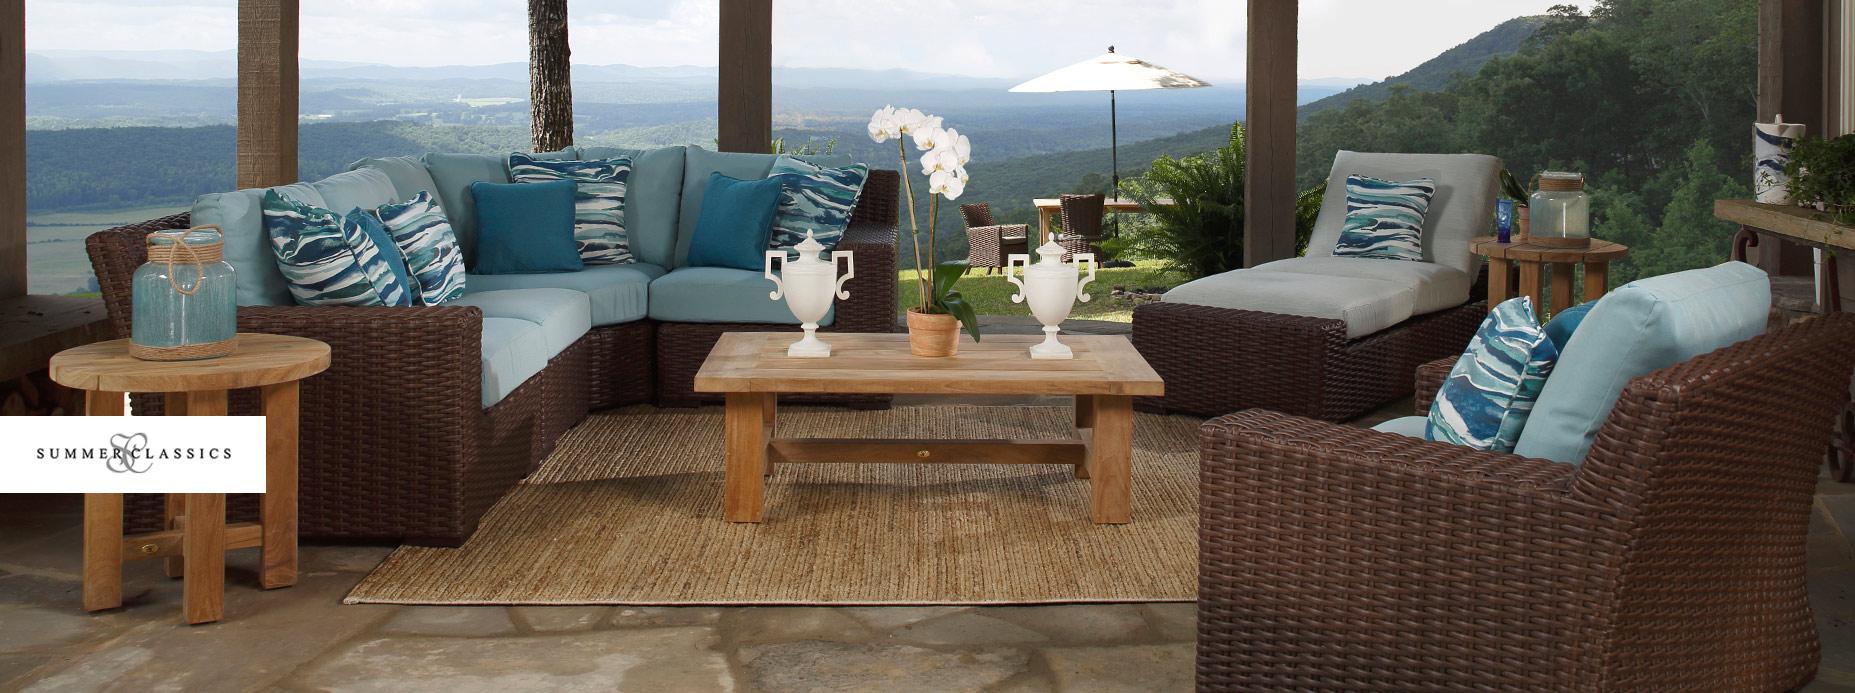 summer classics furniture discount